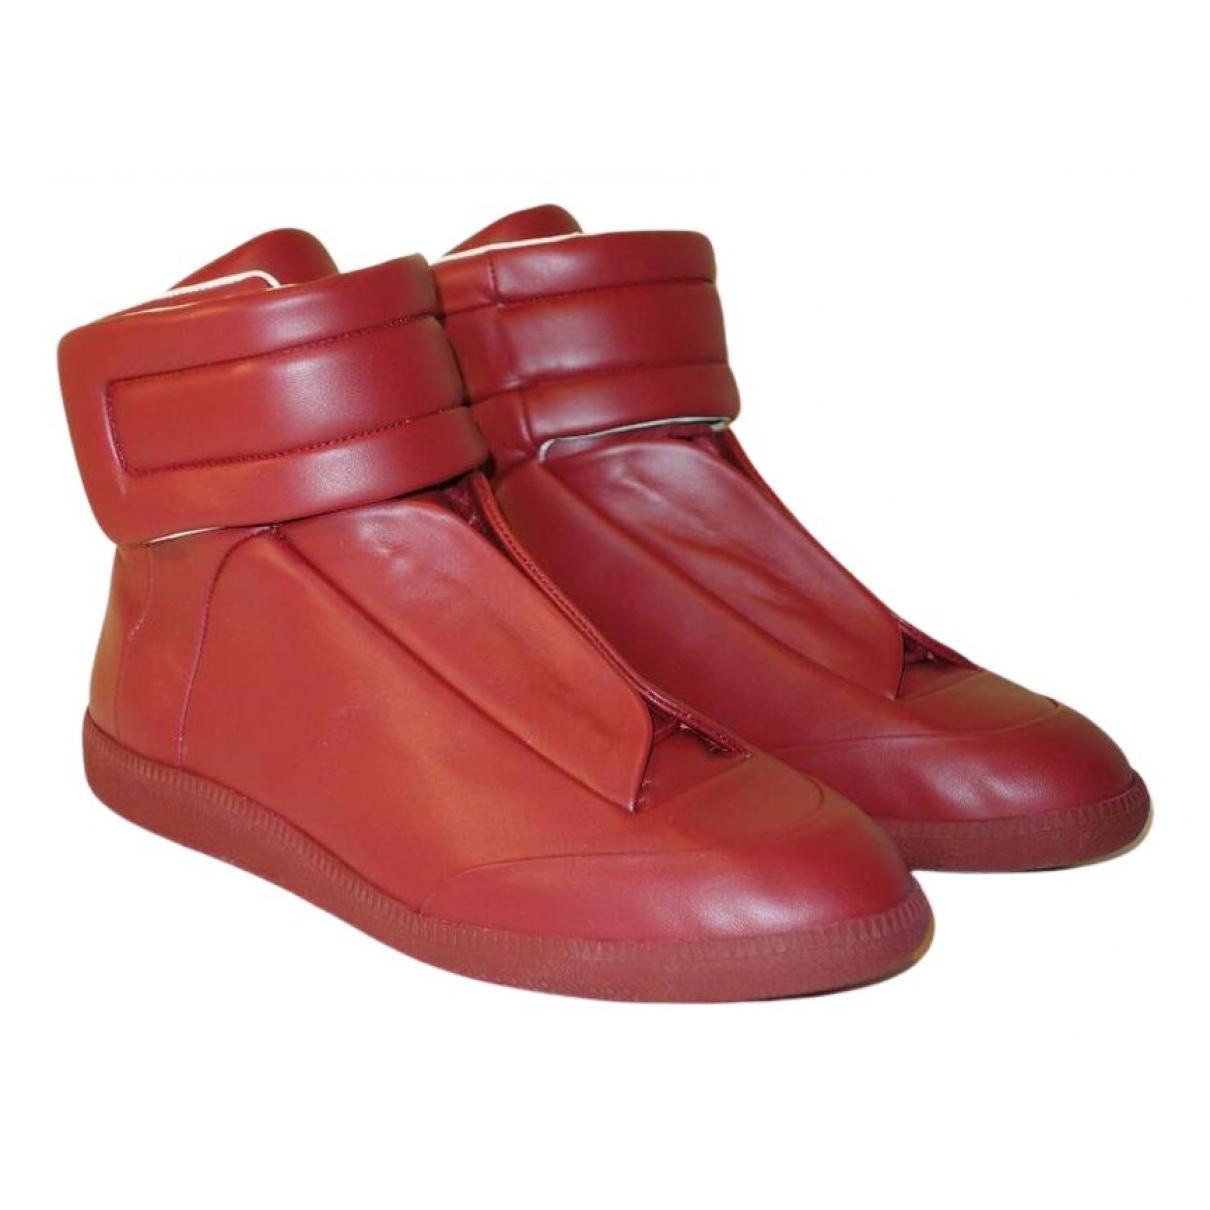 Maison Martin Margiela Future Sneakers in  Rot Leder